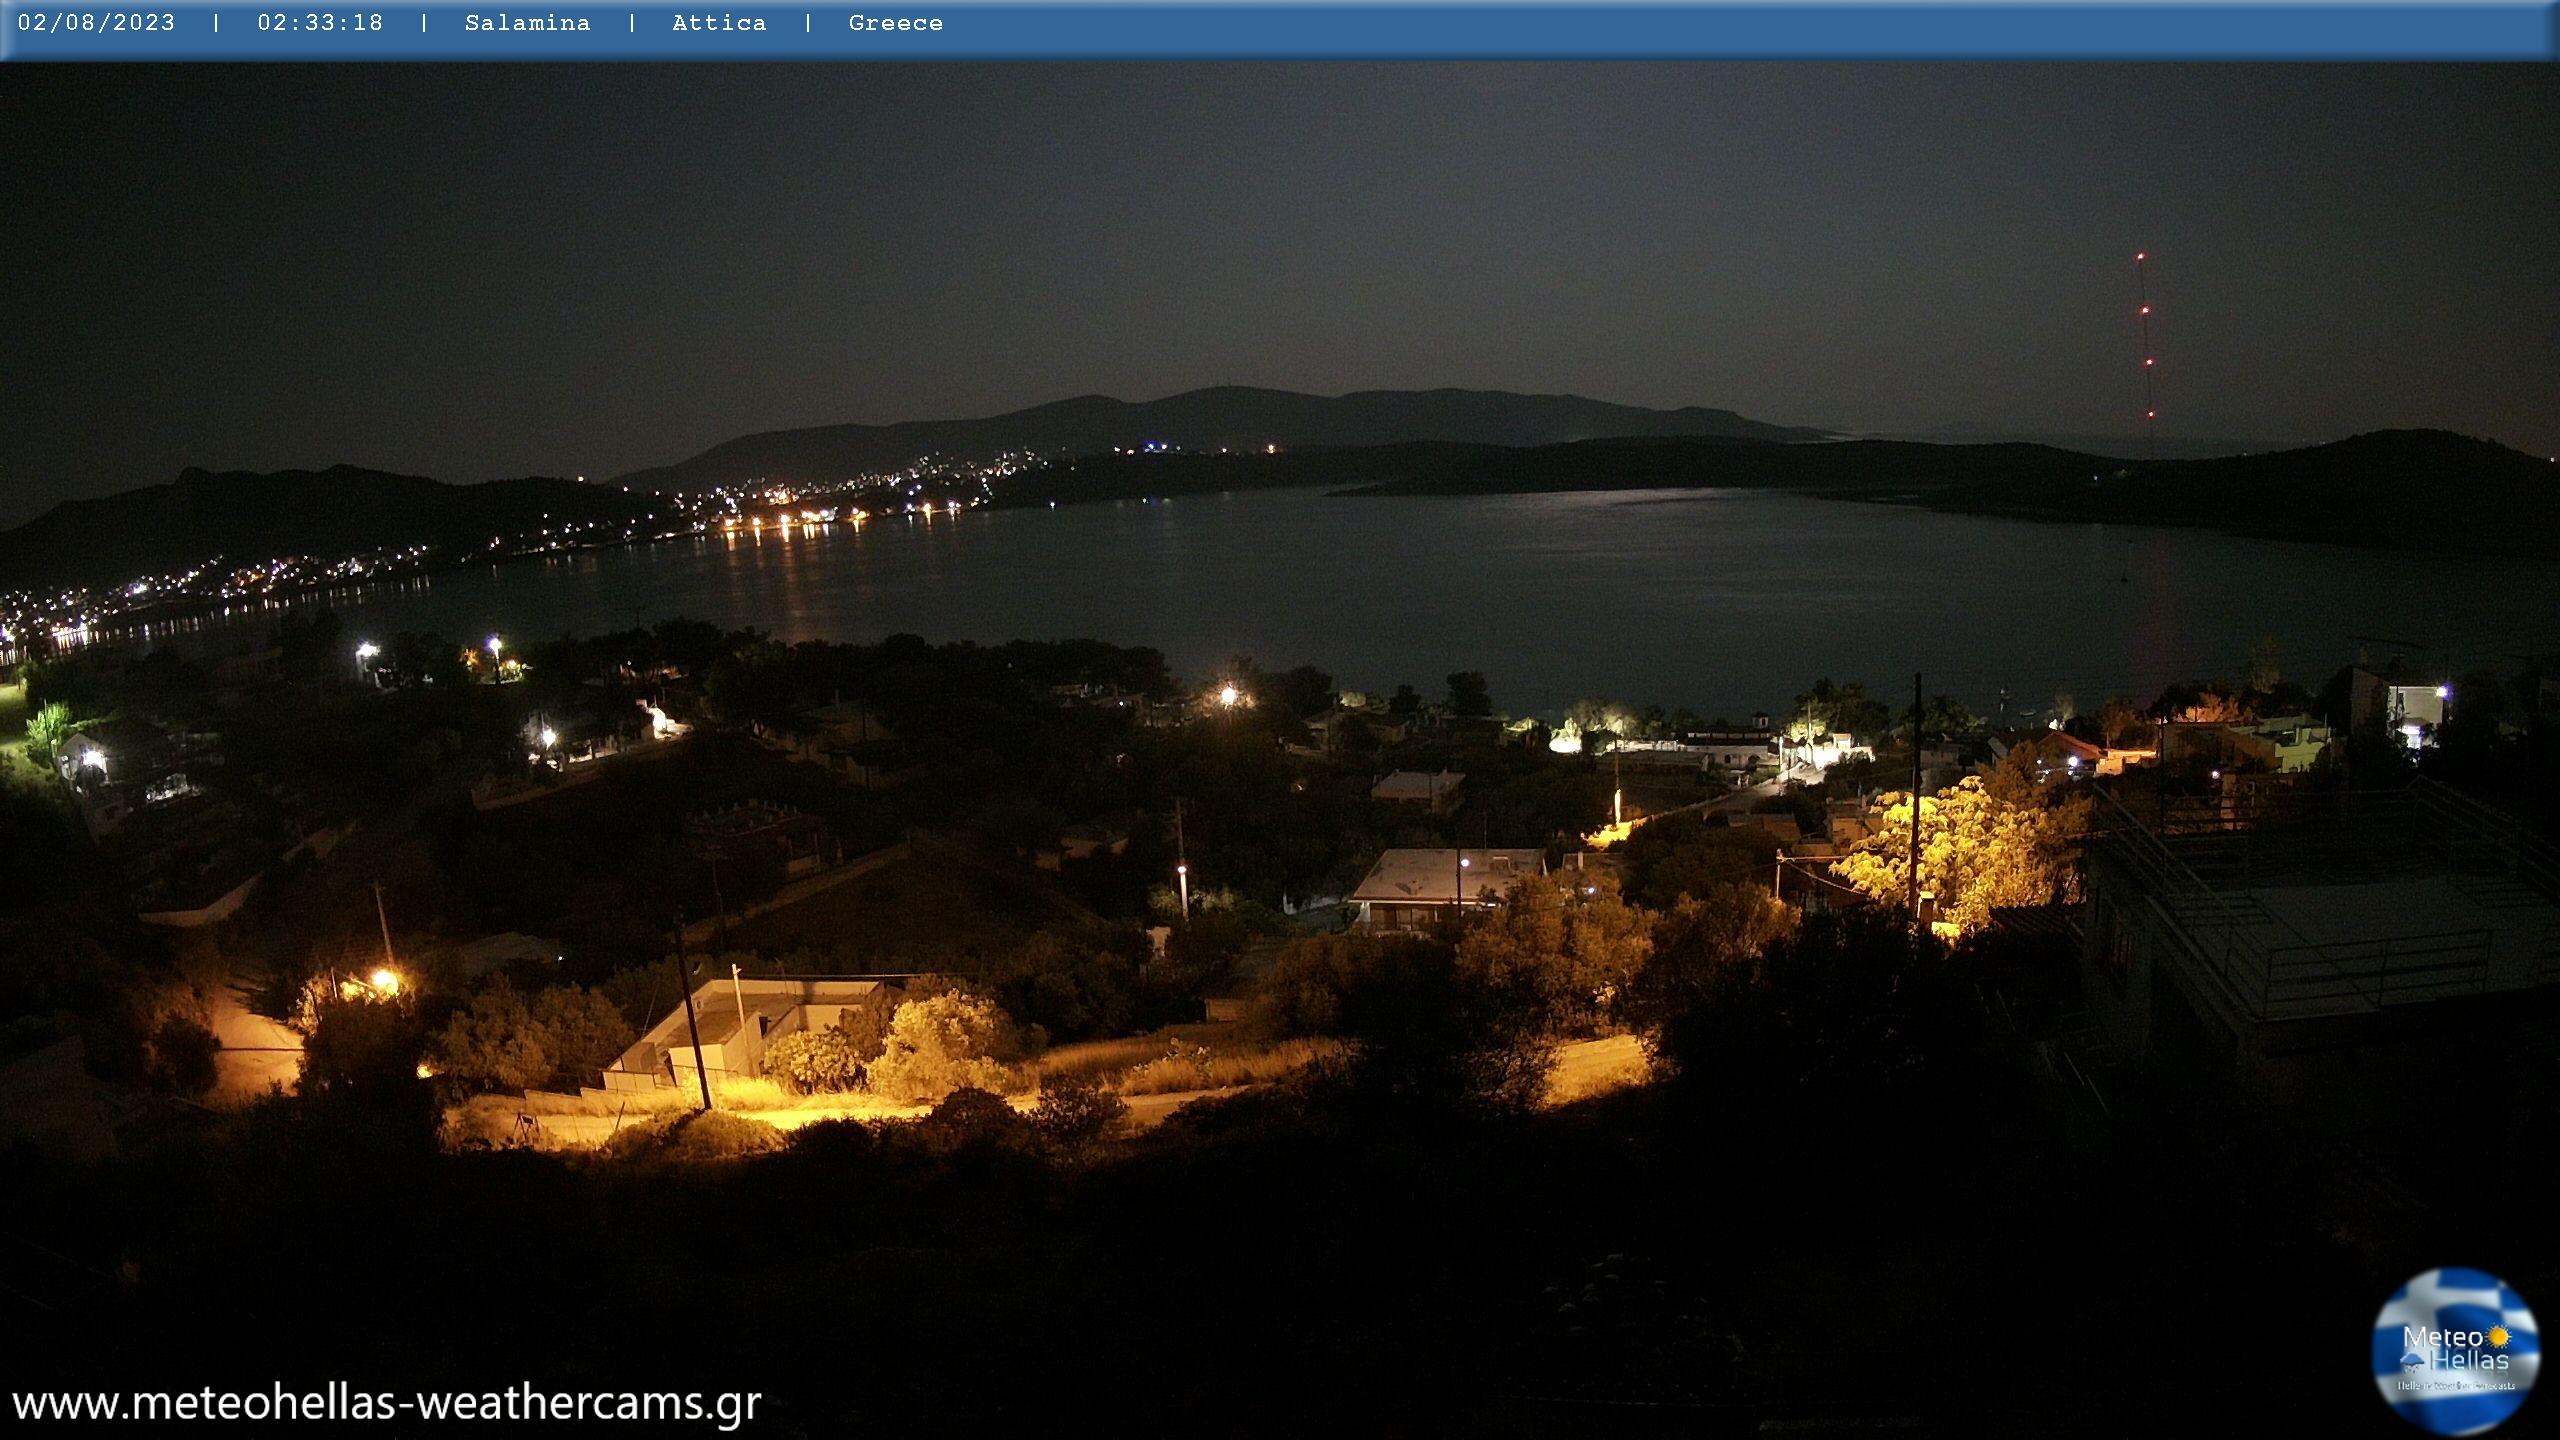 Webcam Salamina 3